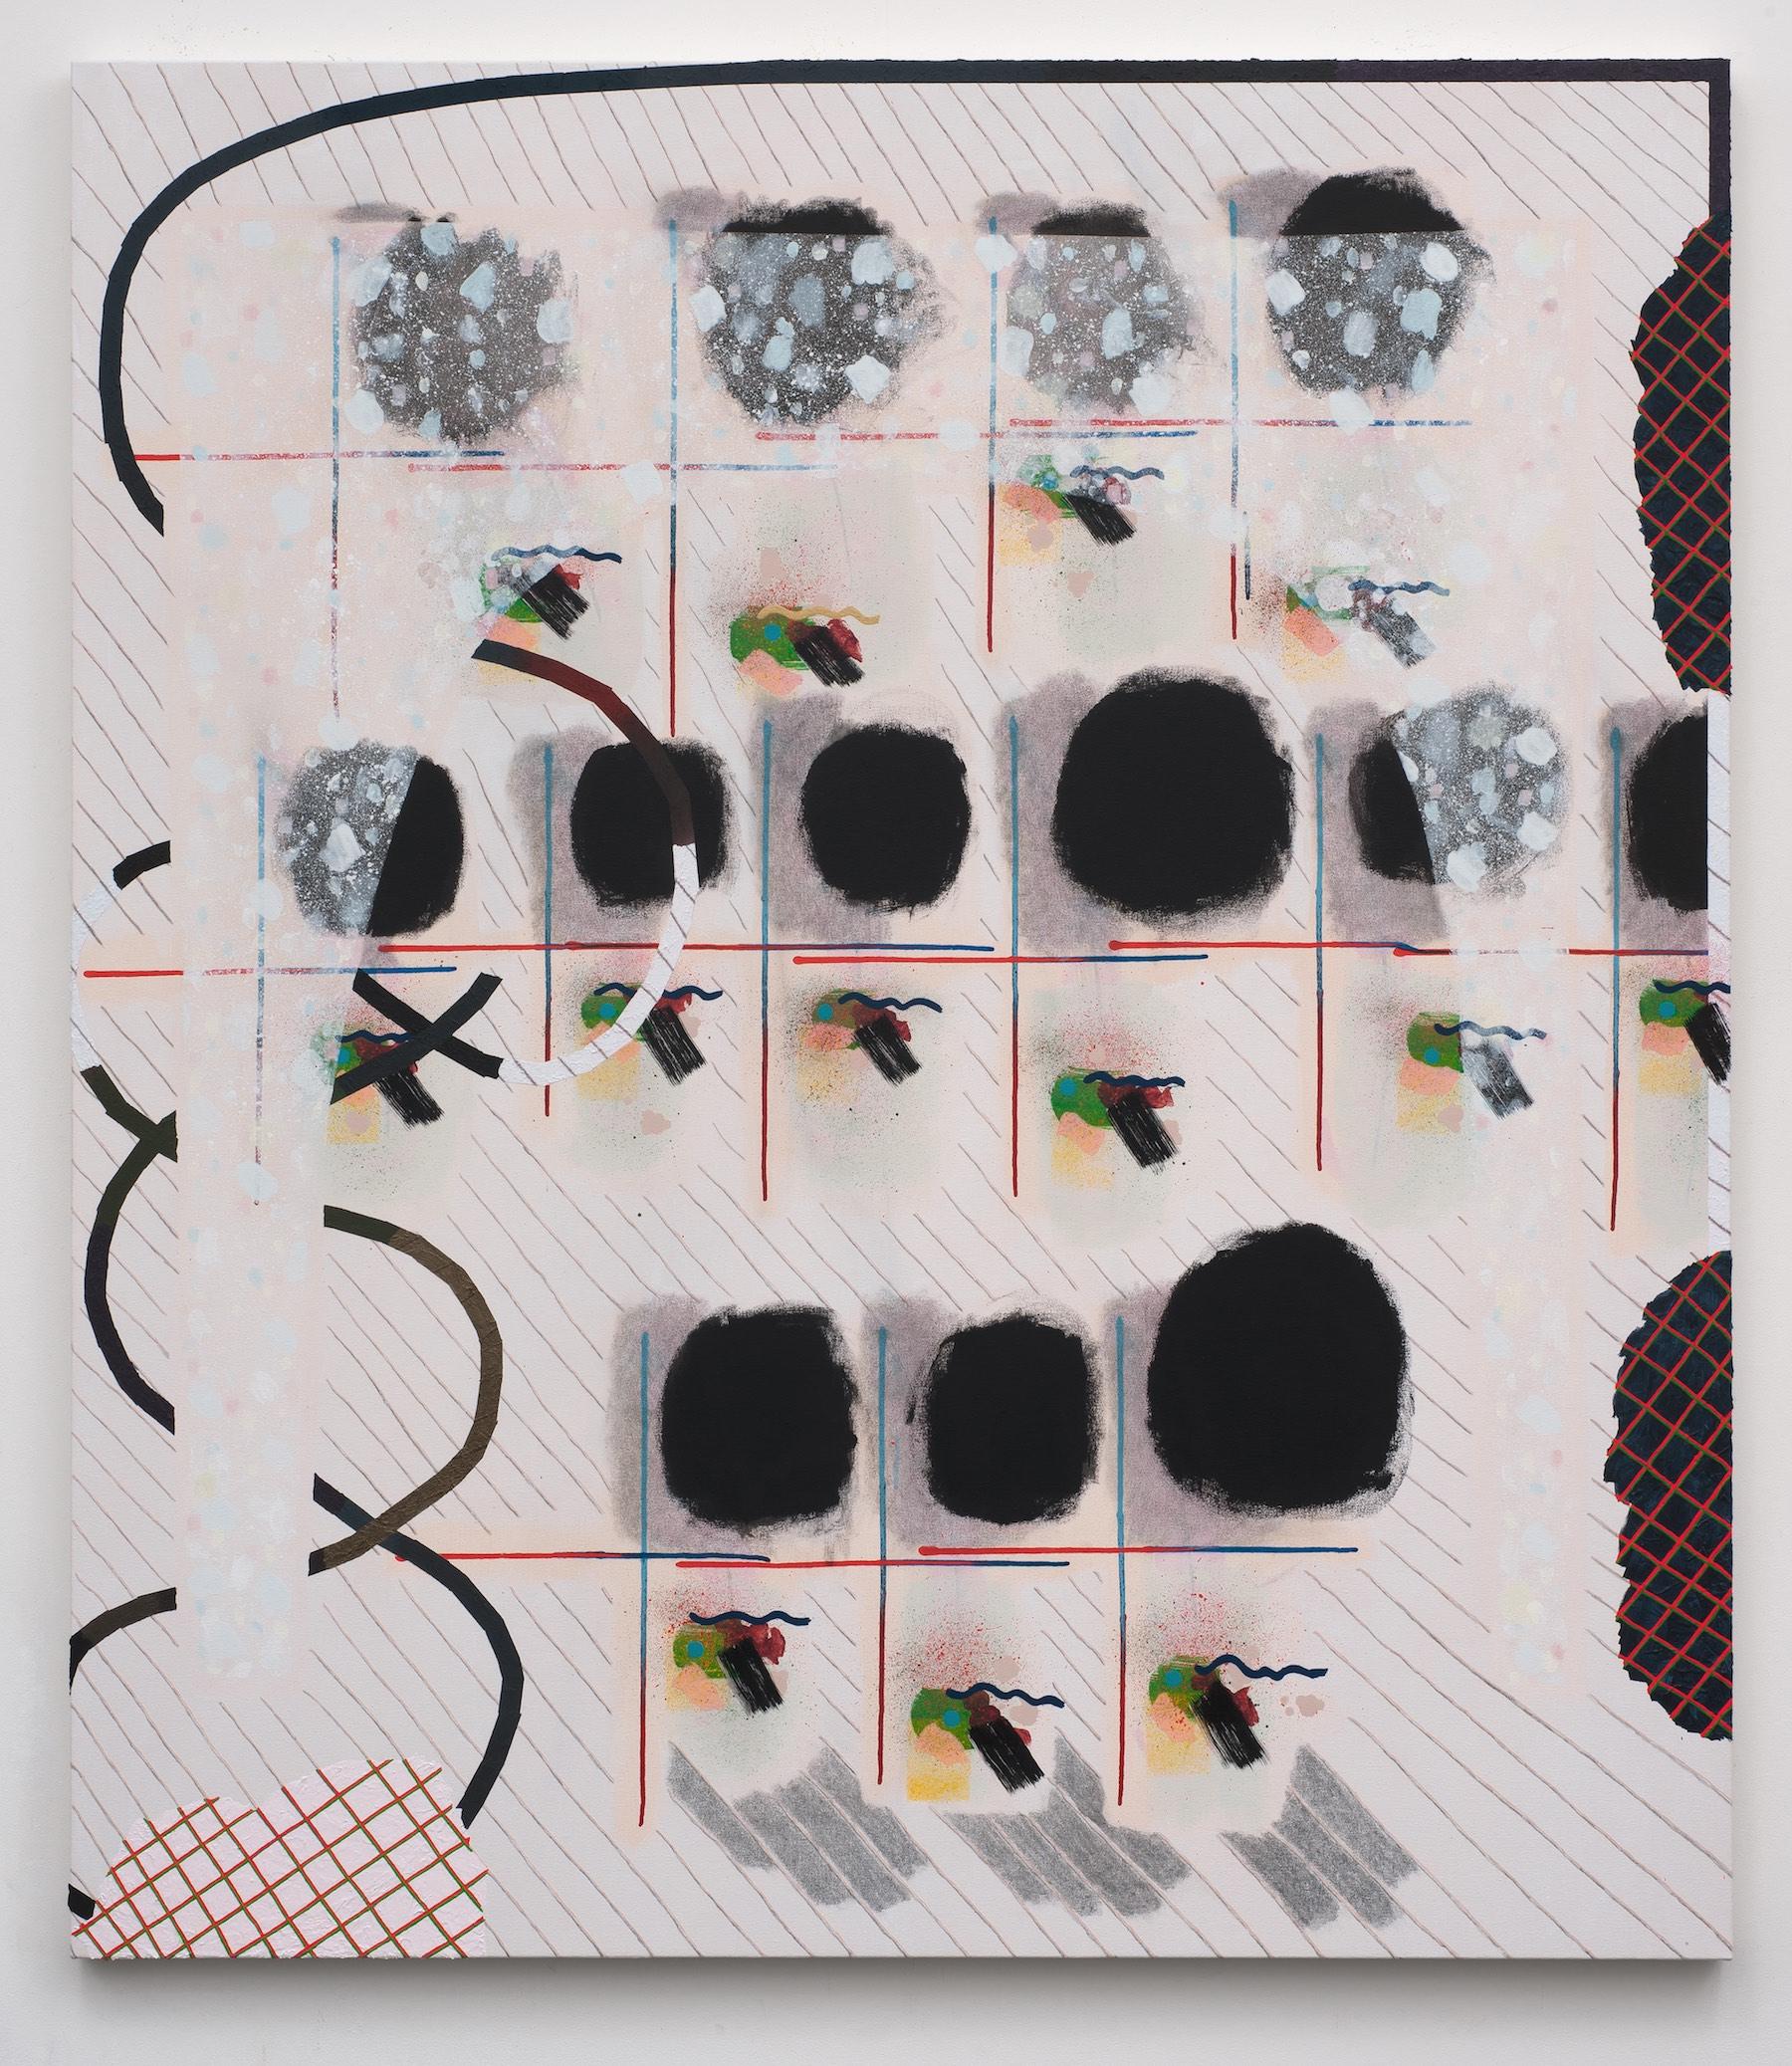 "Allison Miller - Calendar - 2014 - Acrylic, Pencil and Modeling paste on Canvas - 60 x 52.25"""